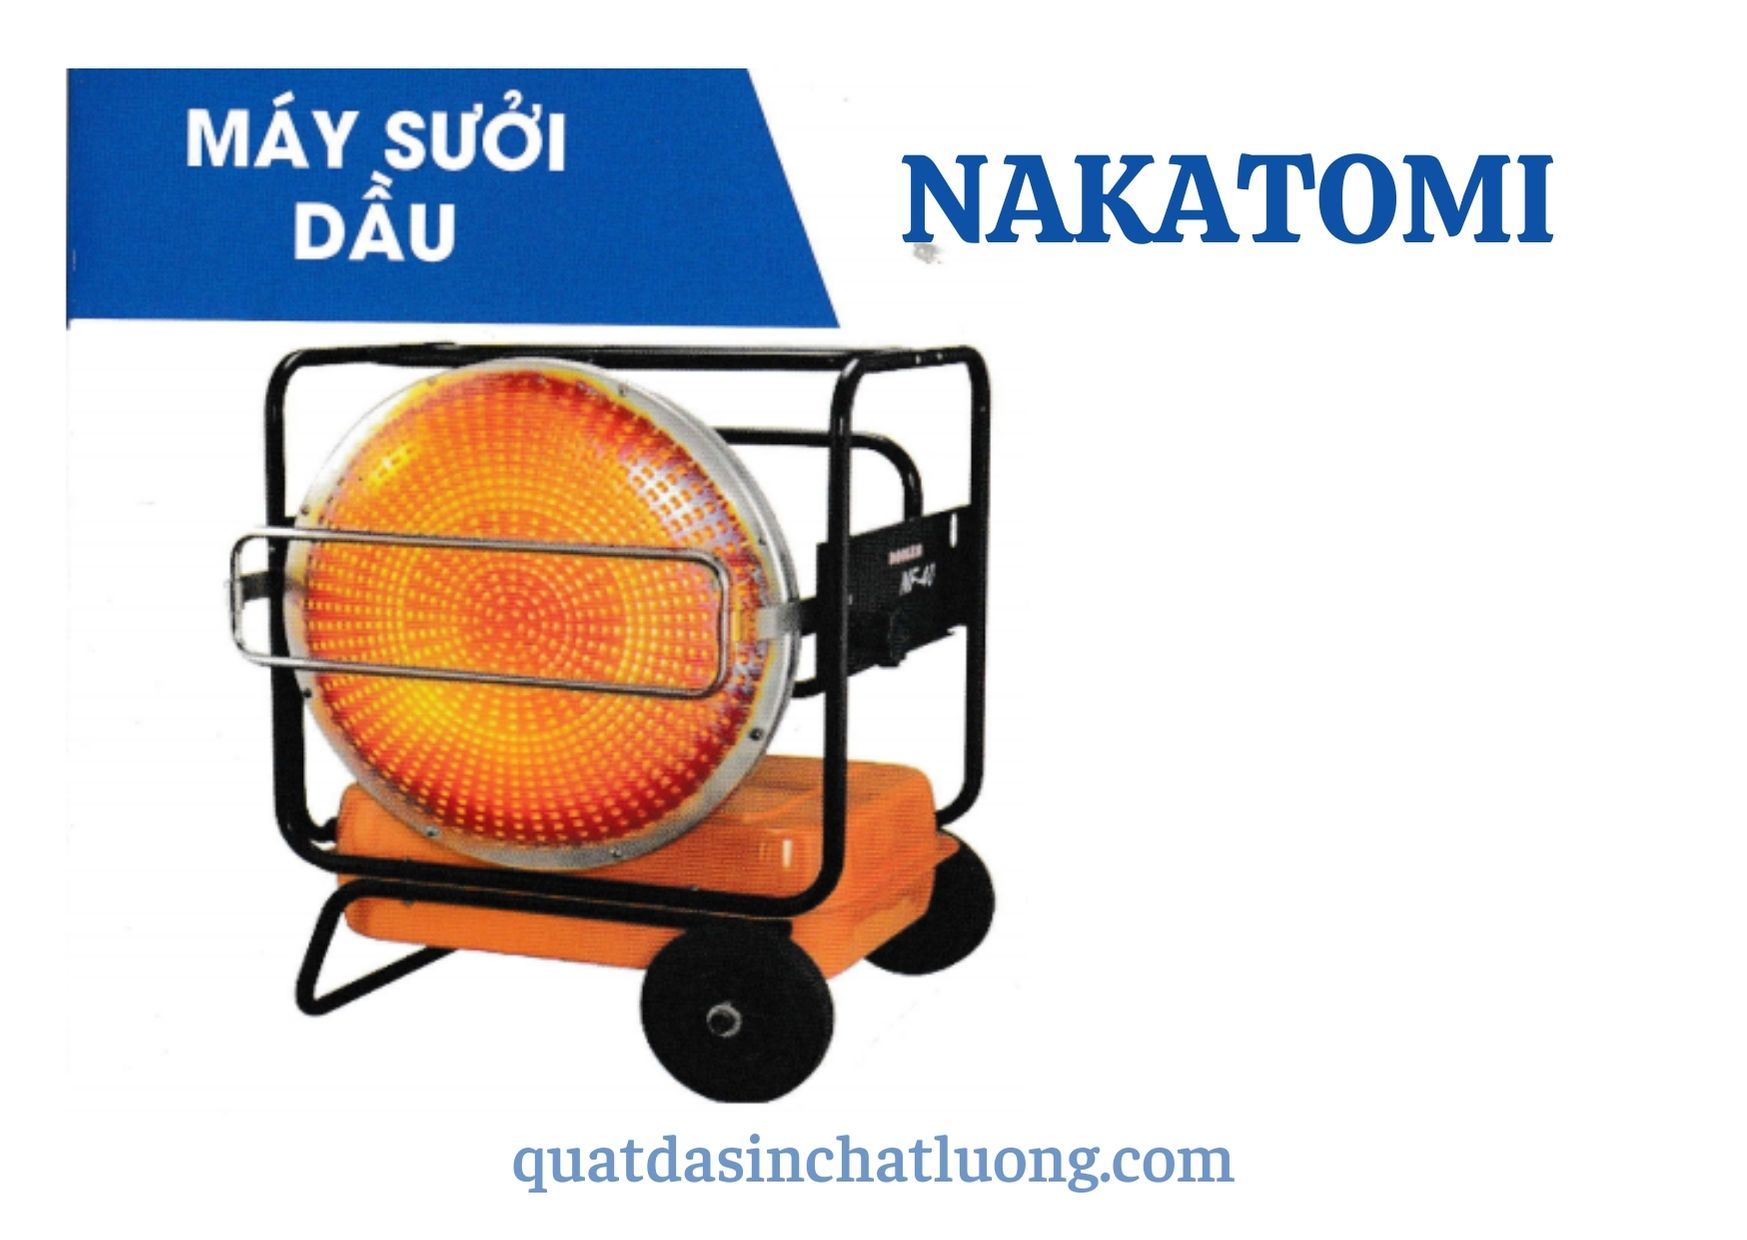 Máy sưởi dầu Nakatomi KH- 115D